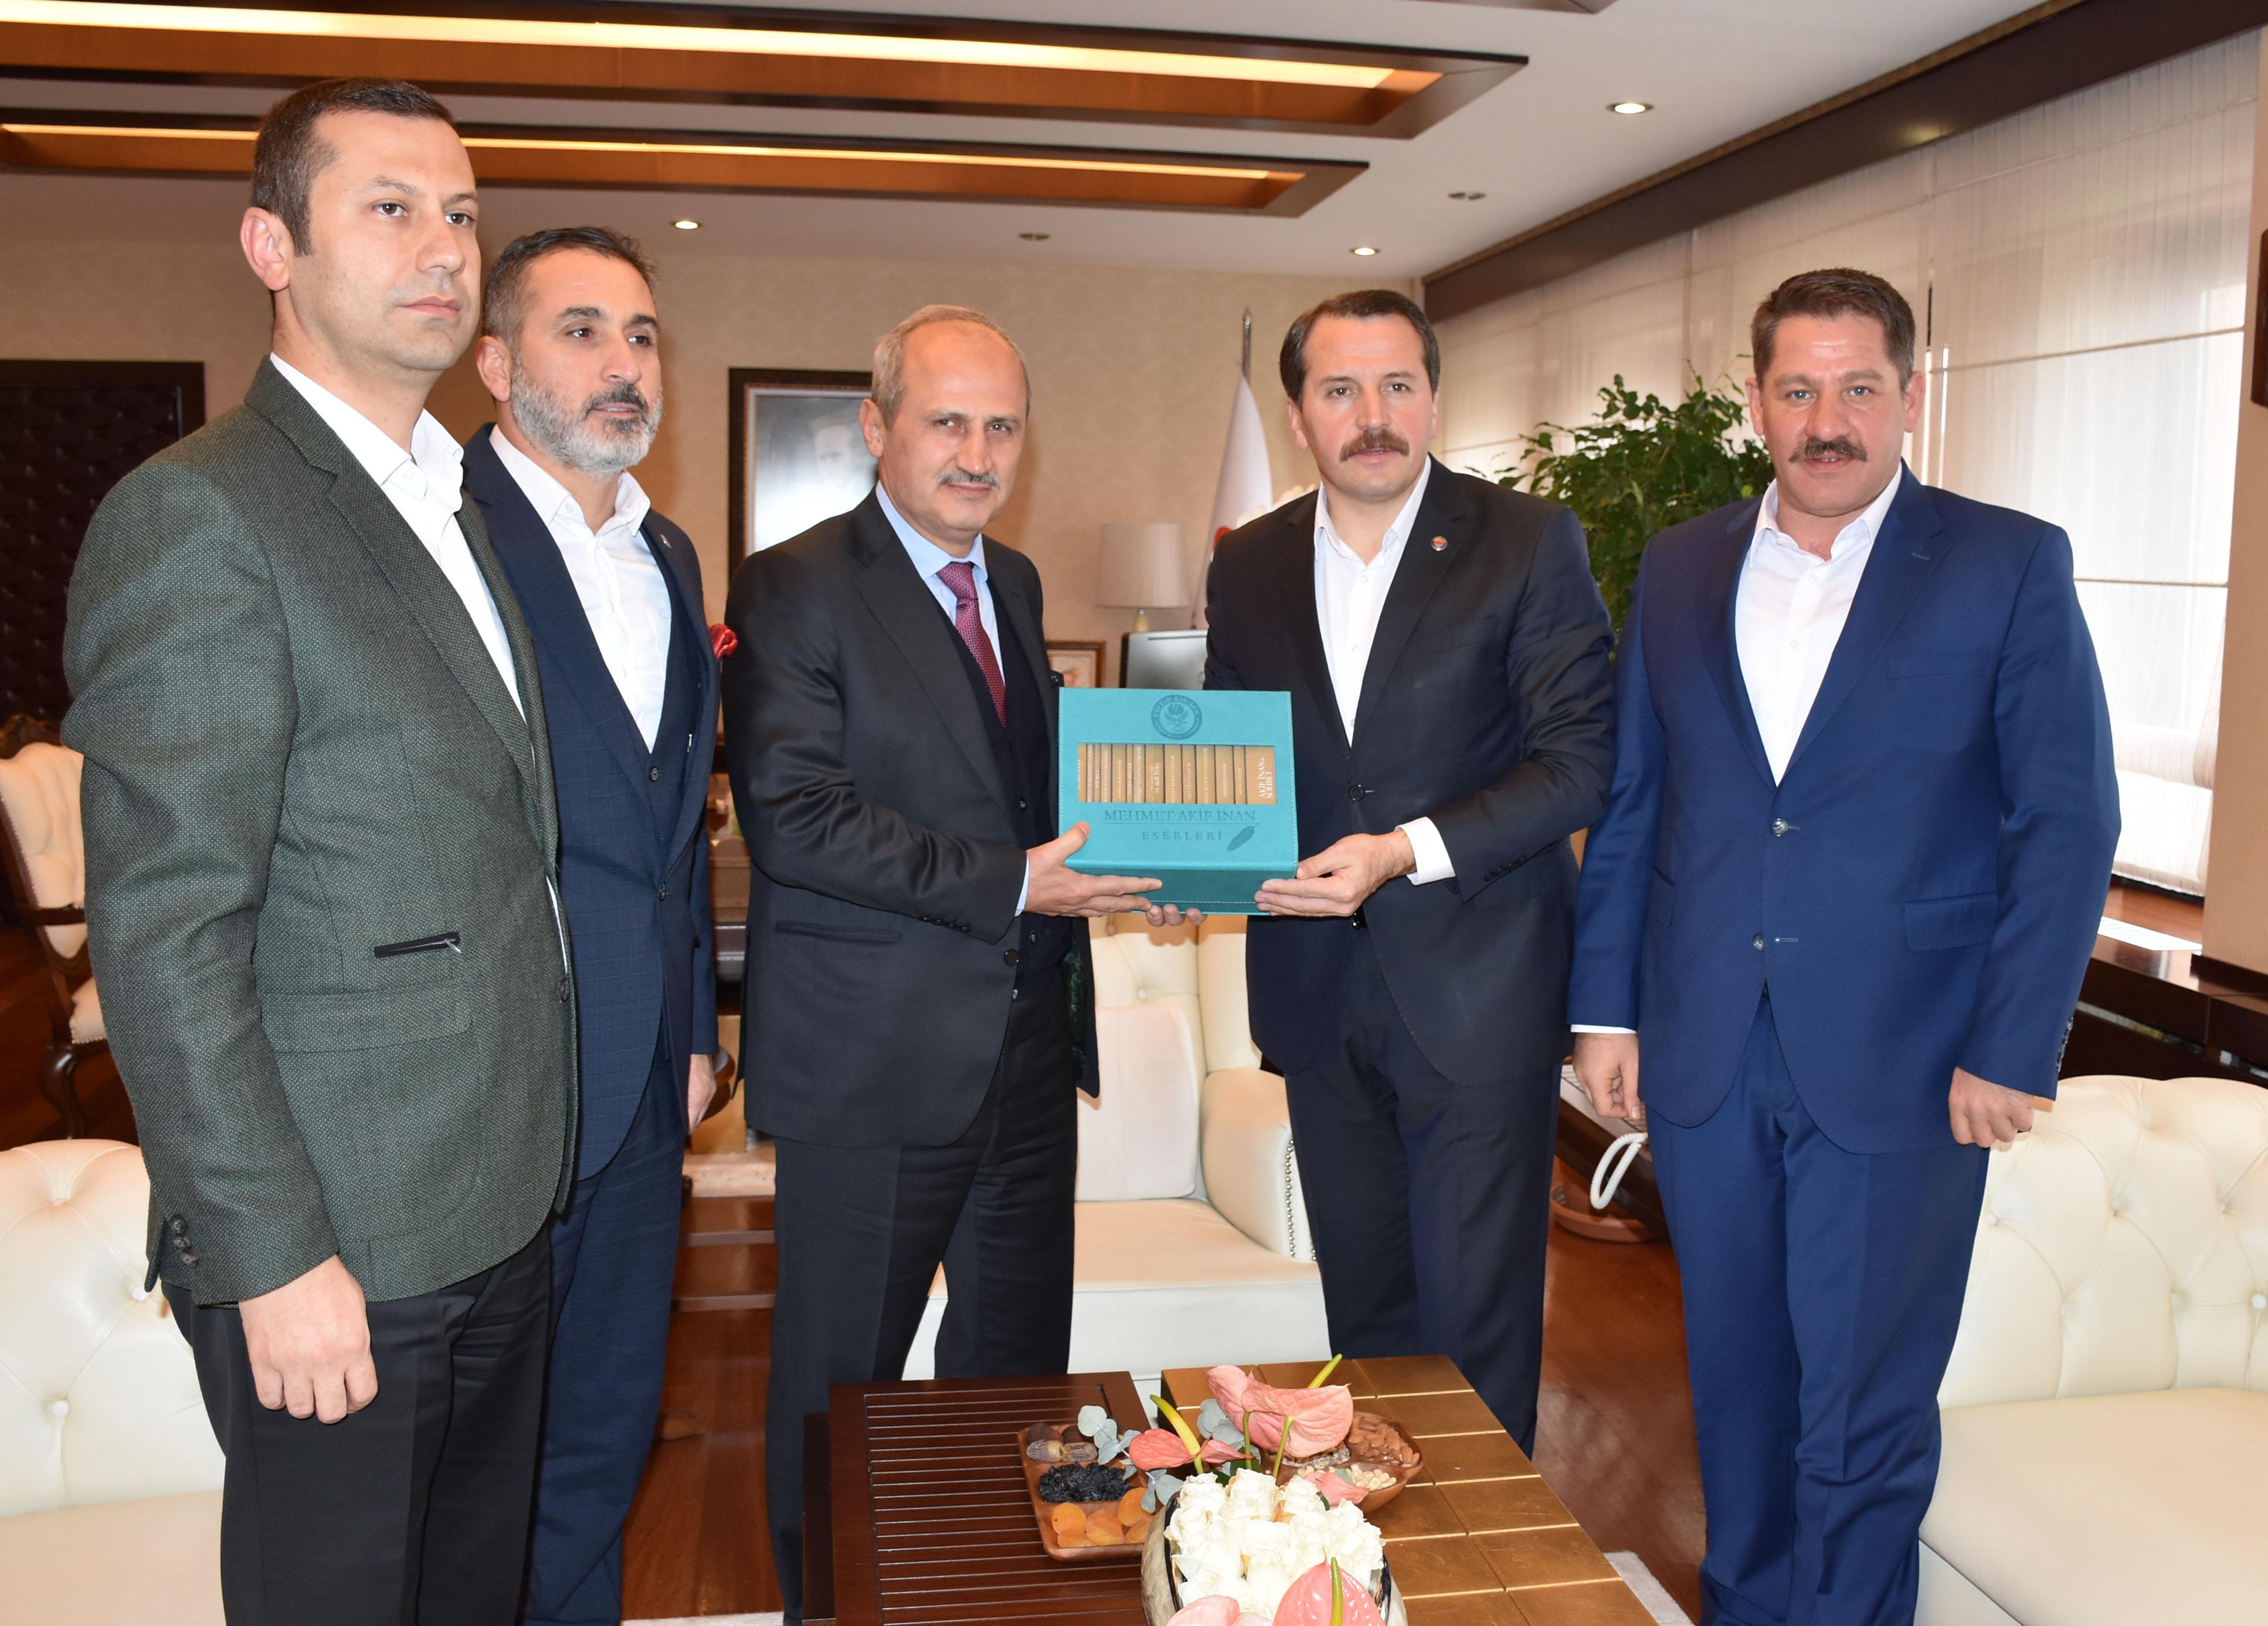 Genel Başkan Budak'tan Bakan Turhan'a Ziyaret